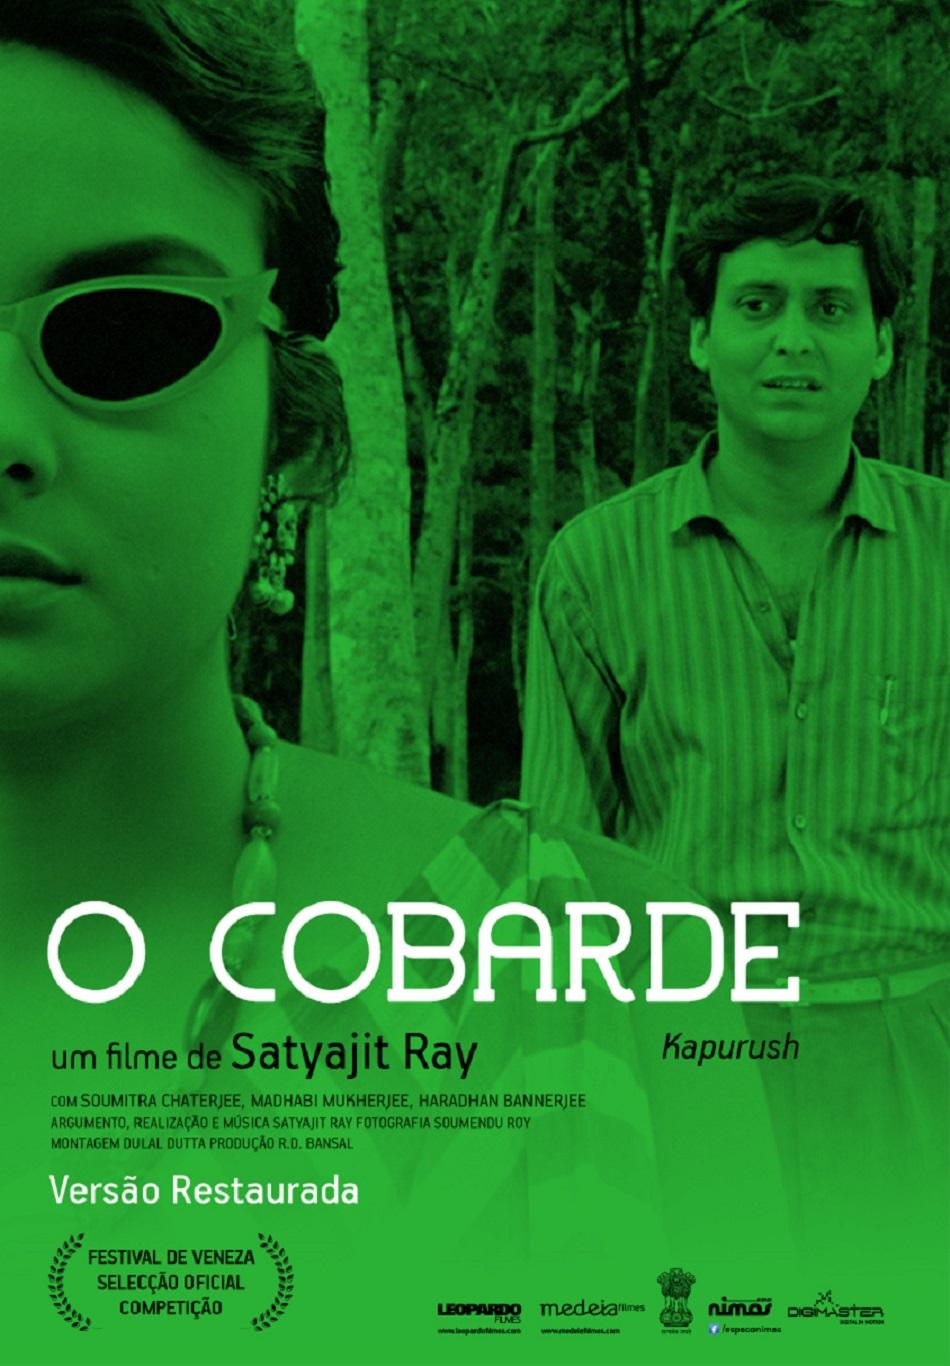 ocobarde_poster2_f2